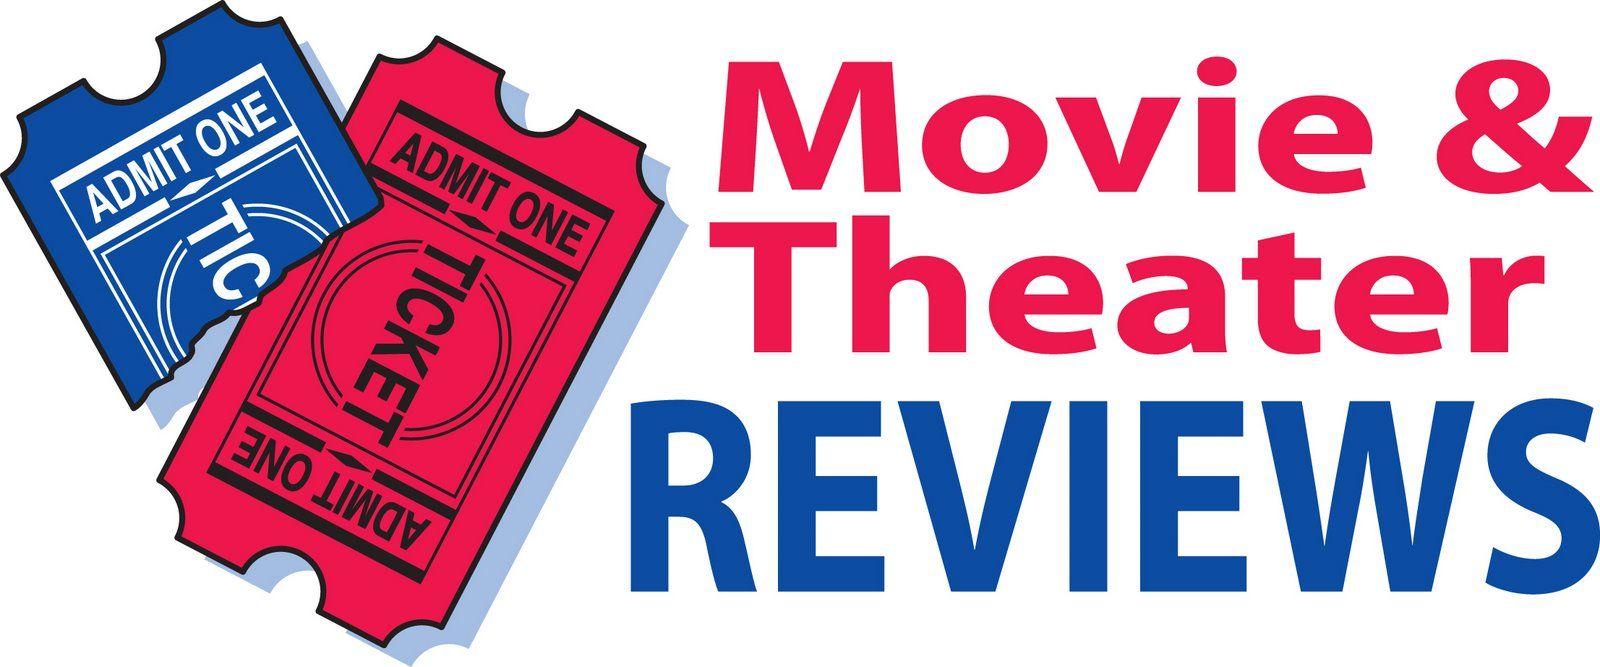 Online Movie Reviews of Latest Bollywood, Hollywood, Punjabi, Tamil, Telugu, Malyalam